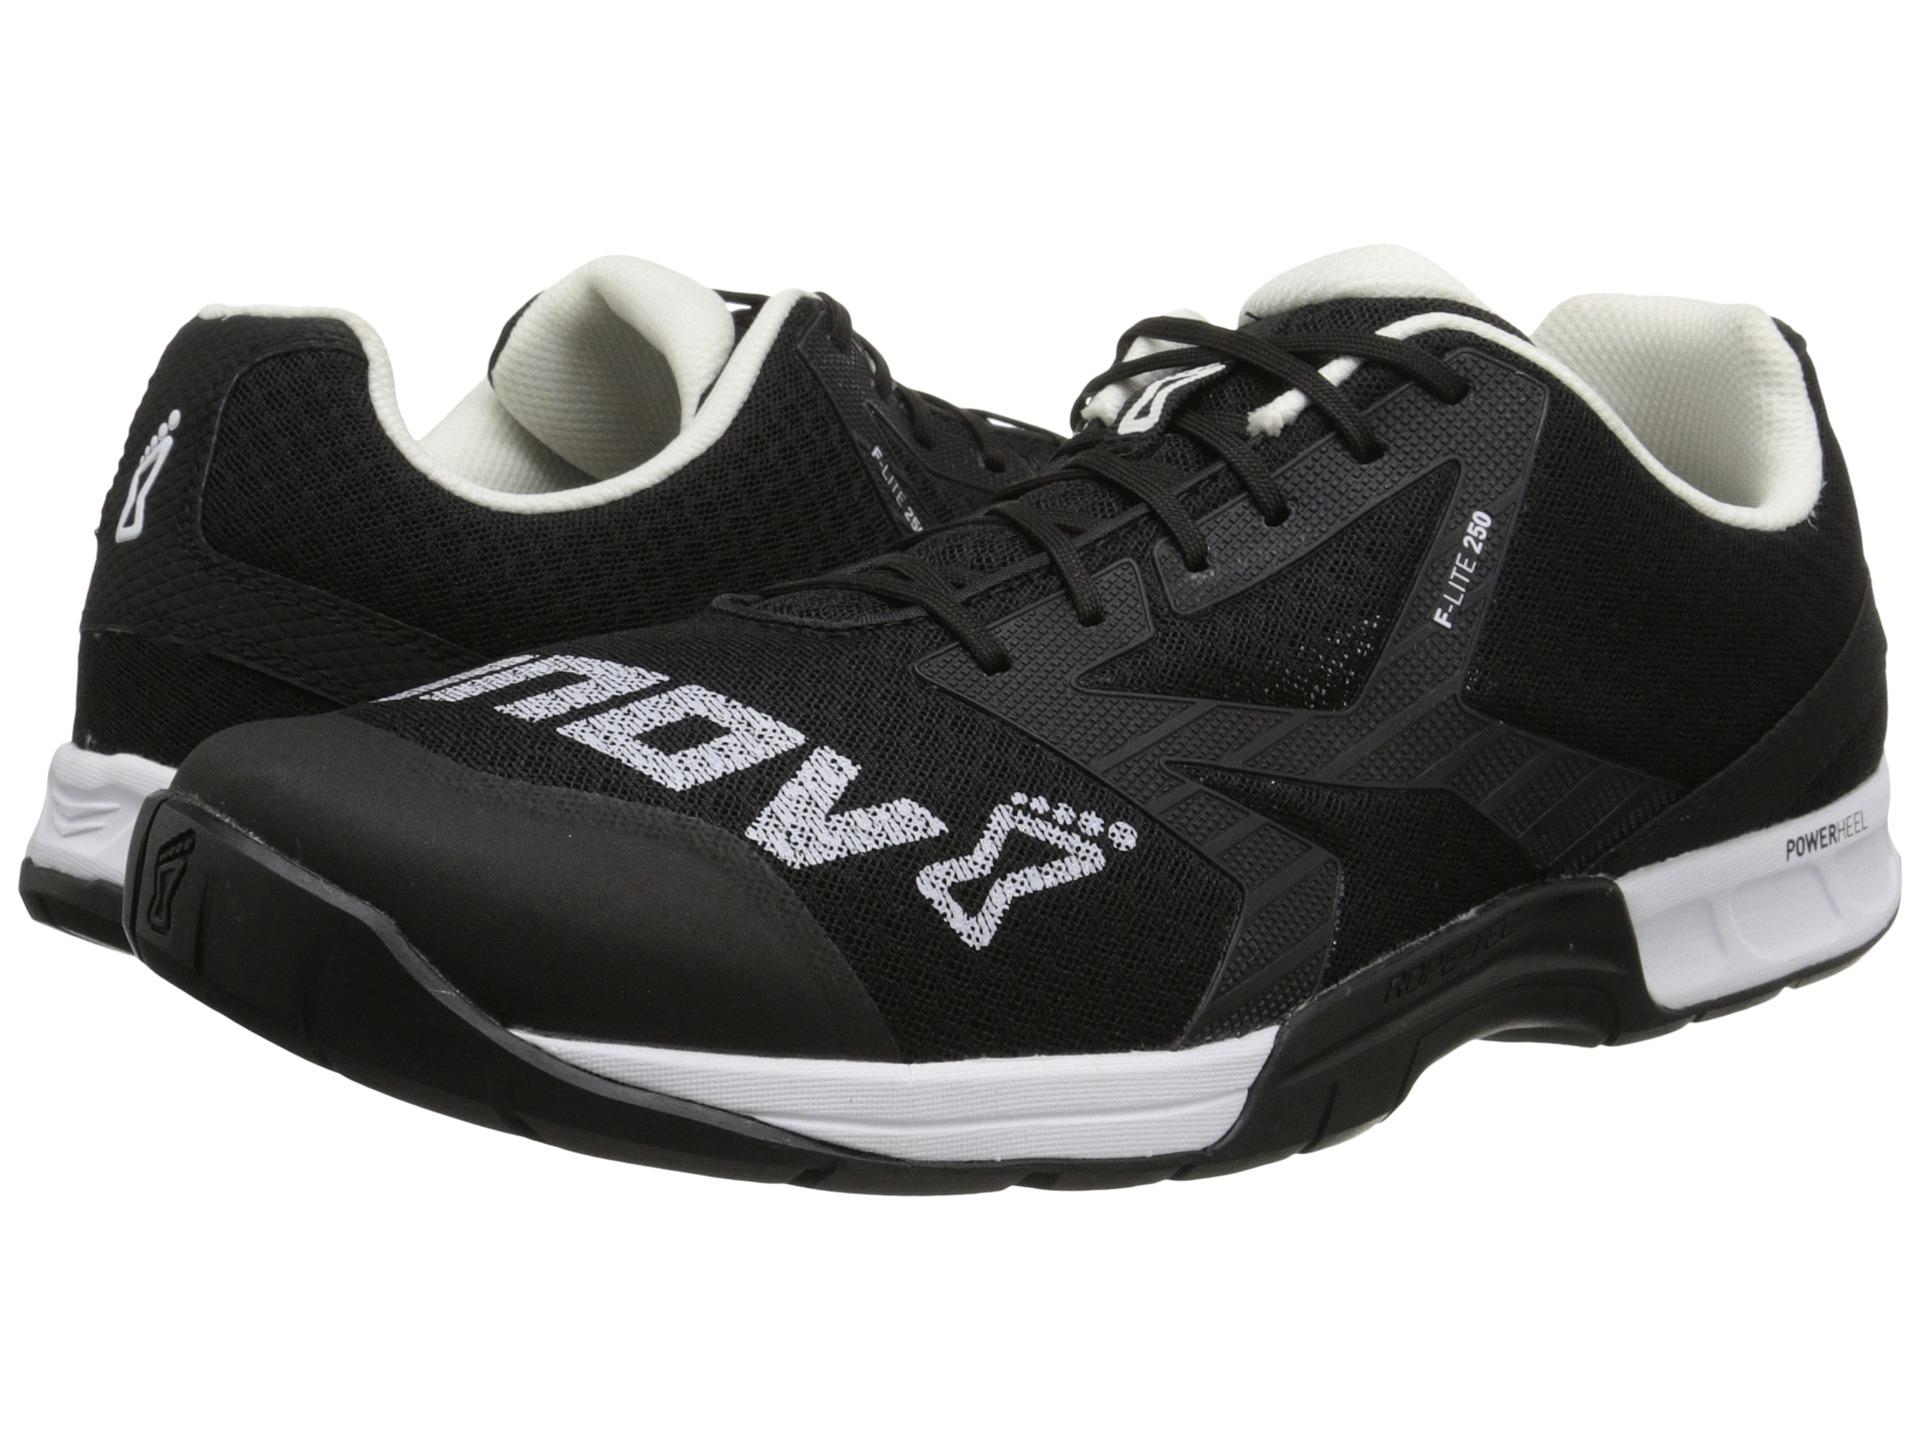 Inov-8 F-lite 250 Sports Shoes in Black for Men   Lyst